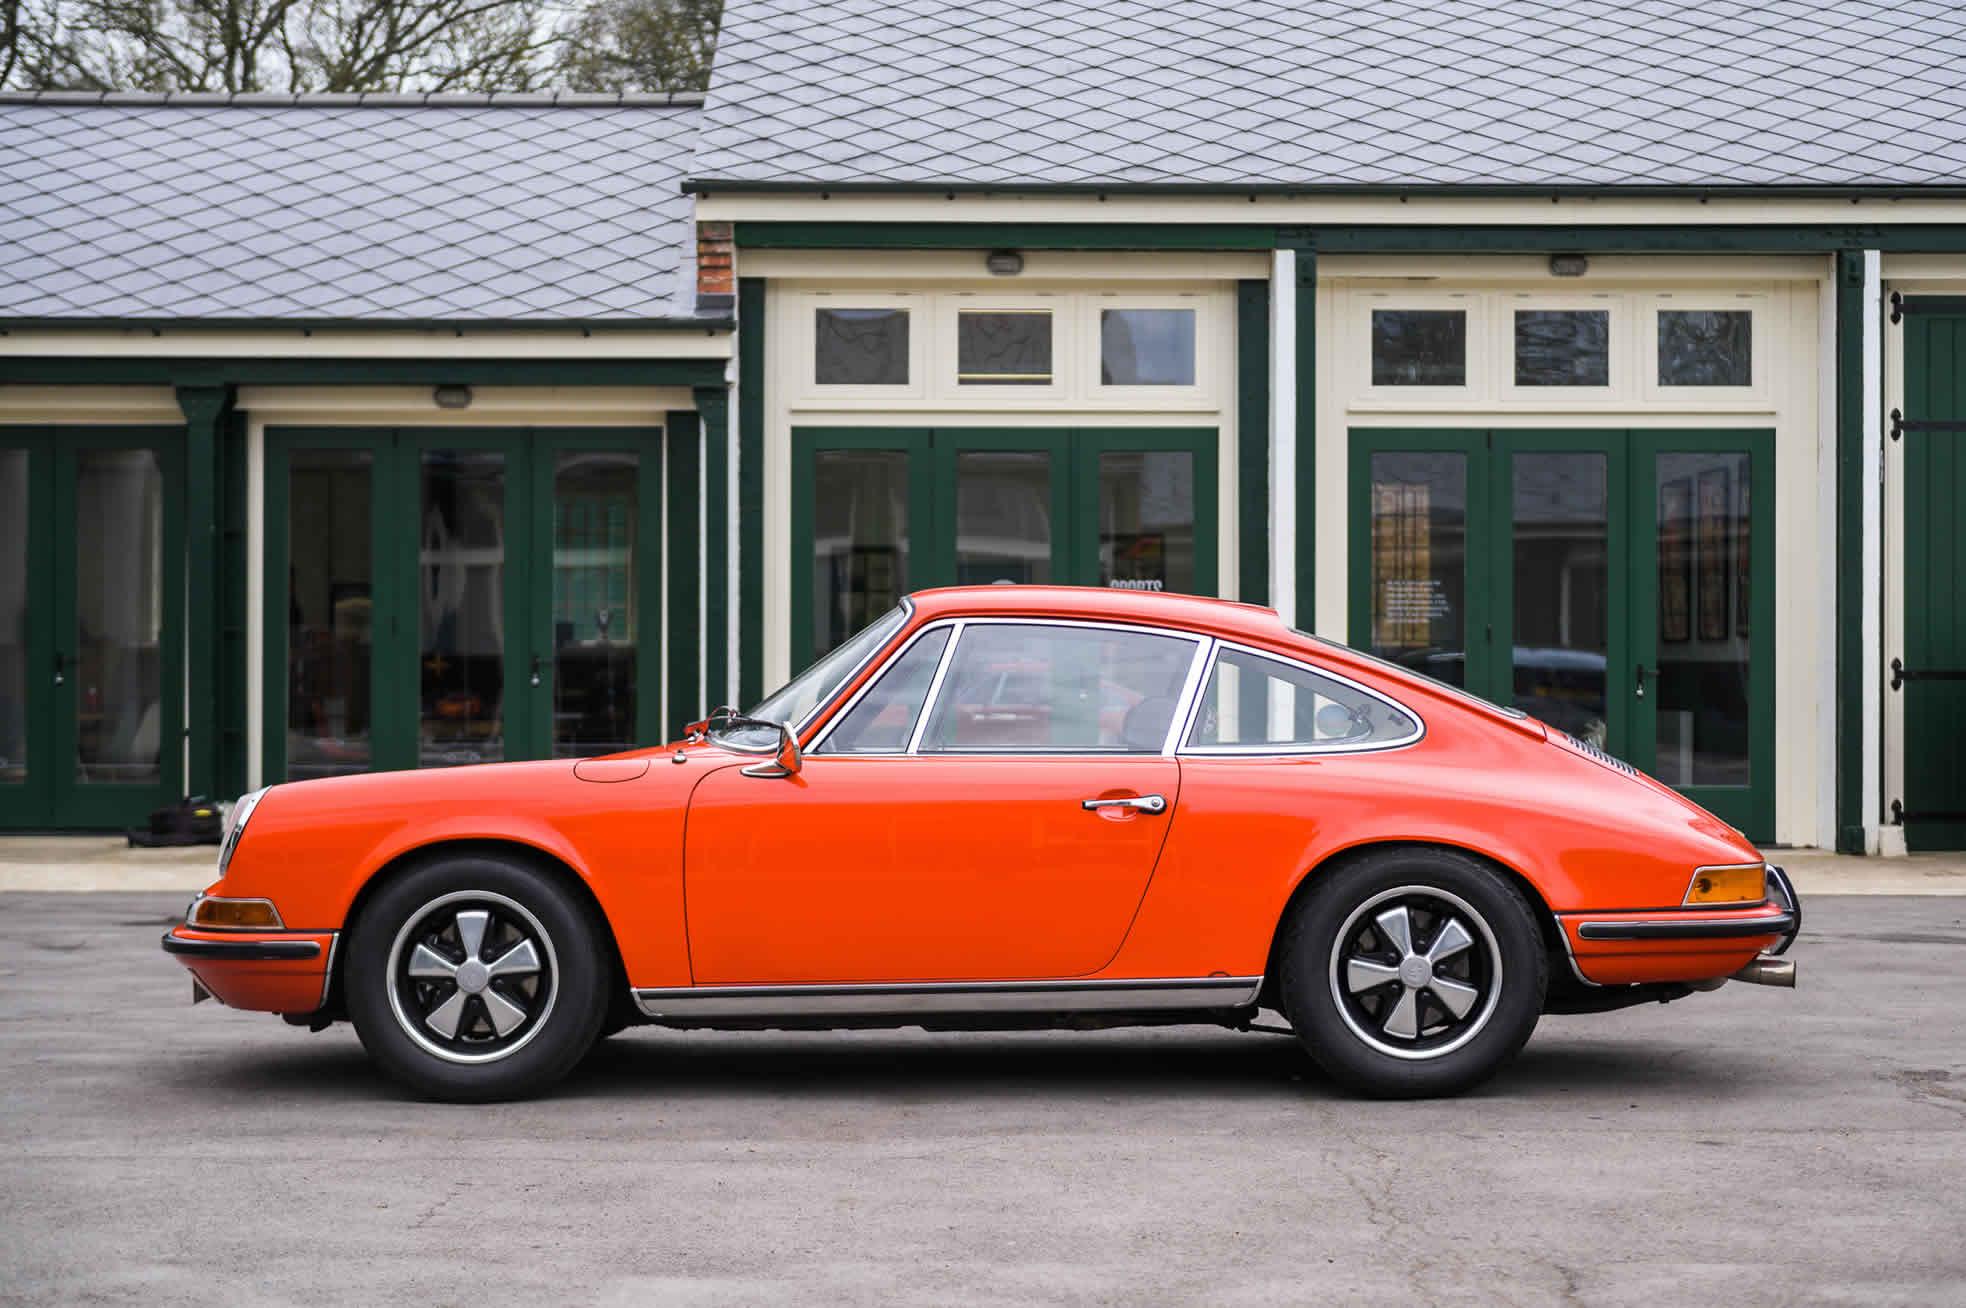 For Sale 1970 Porsche 911S 2.2 side view